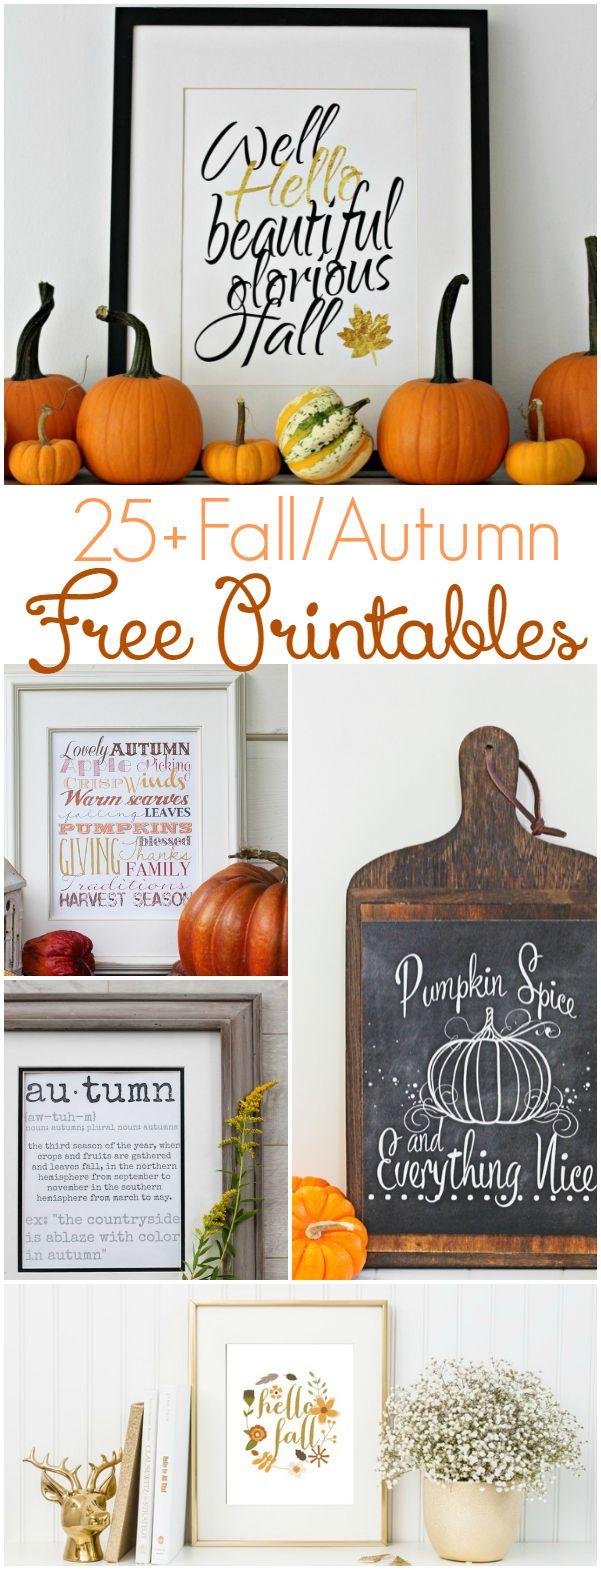 25+ fall free printables | lollyjane.com